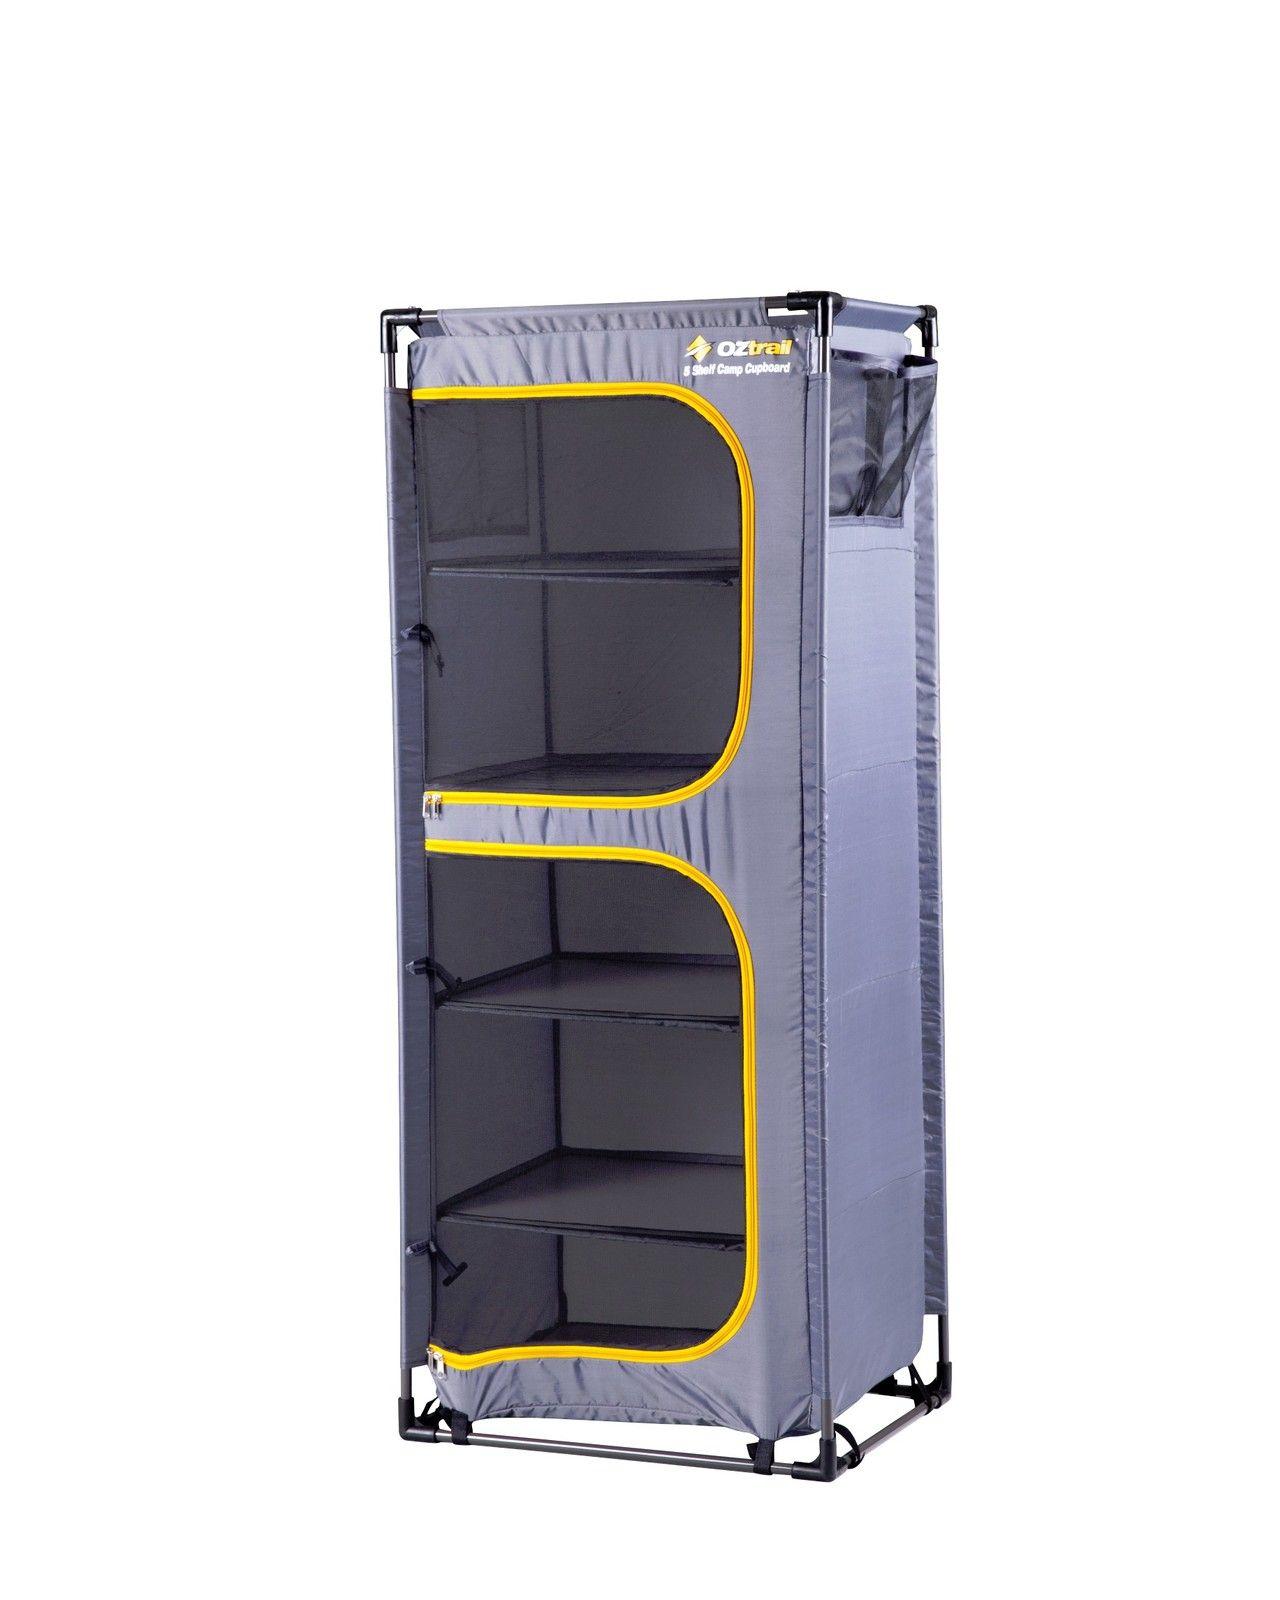 Oztrail 5 Shelf Camp Cupboard Camping Storage Locker Storage Storage